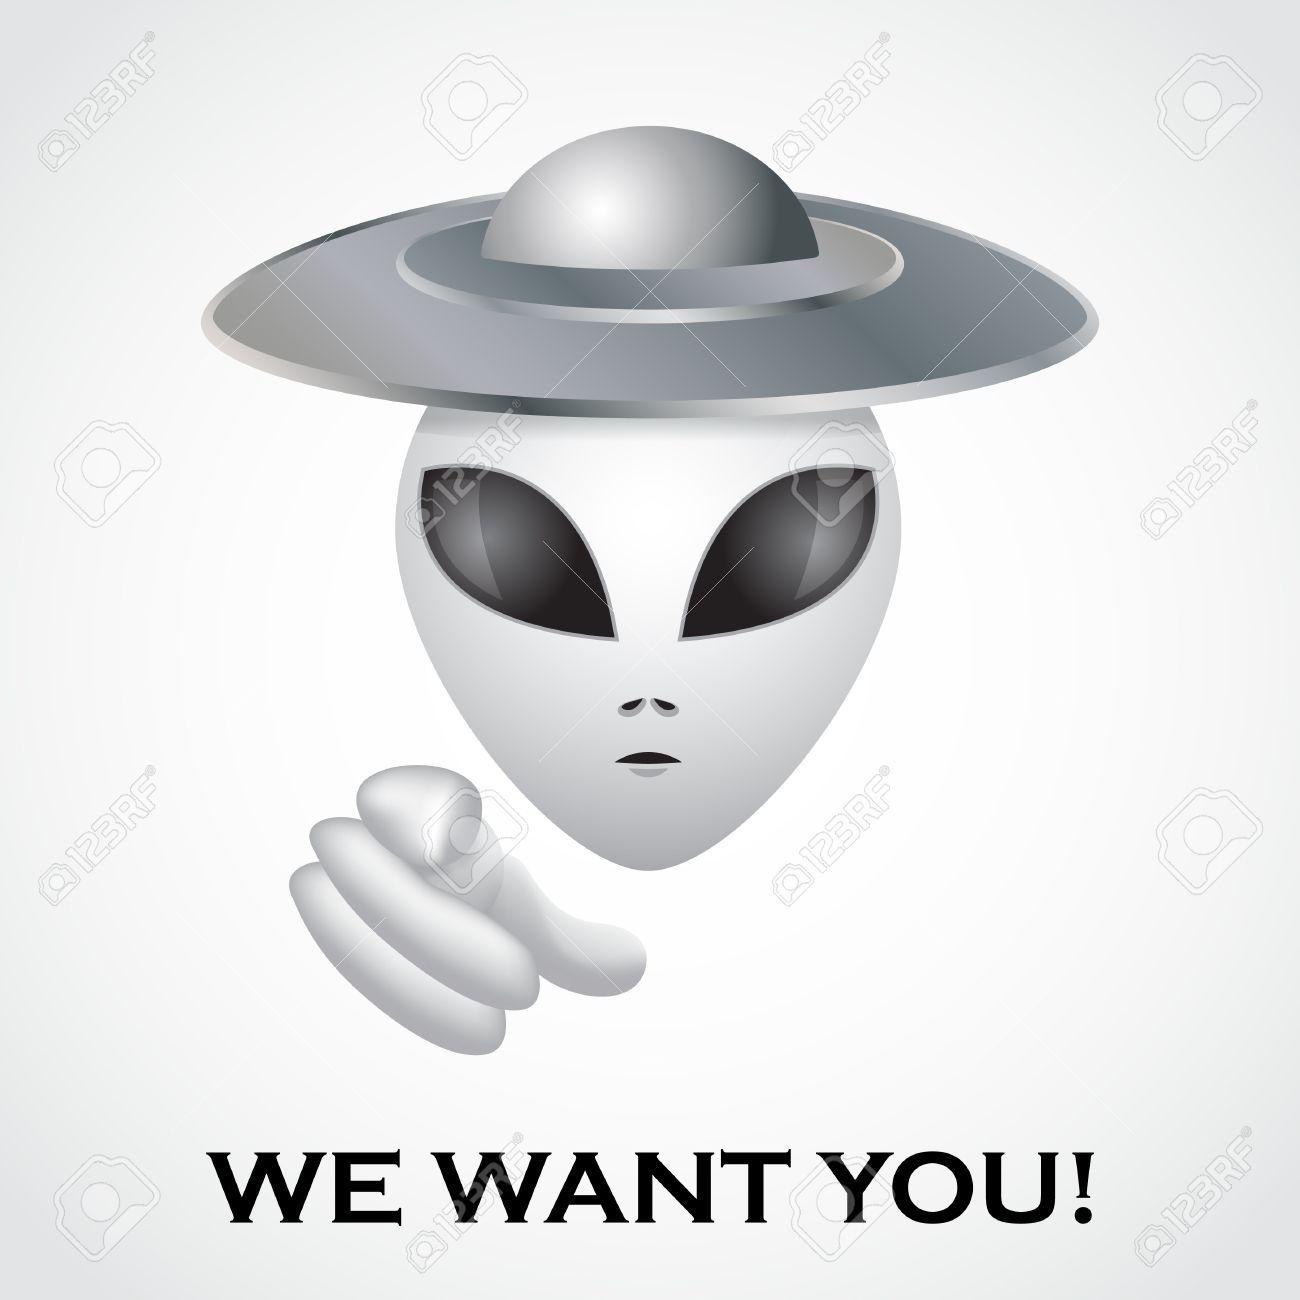 a3a84a6ebcf181 Hey alien hats quite a sombrero you got there humor jpg 1300x1300 Alien  sombrero